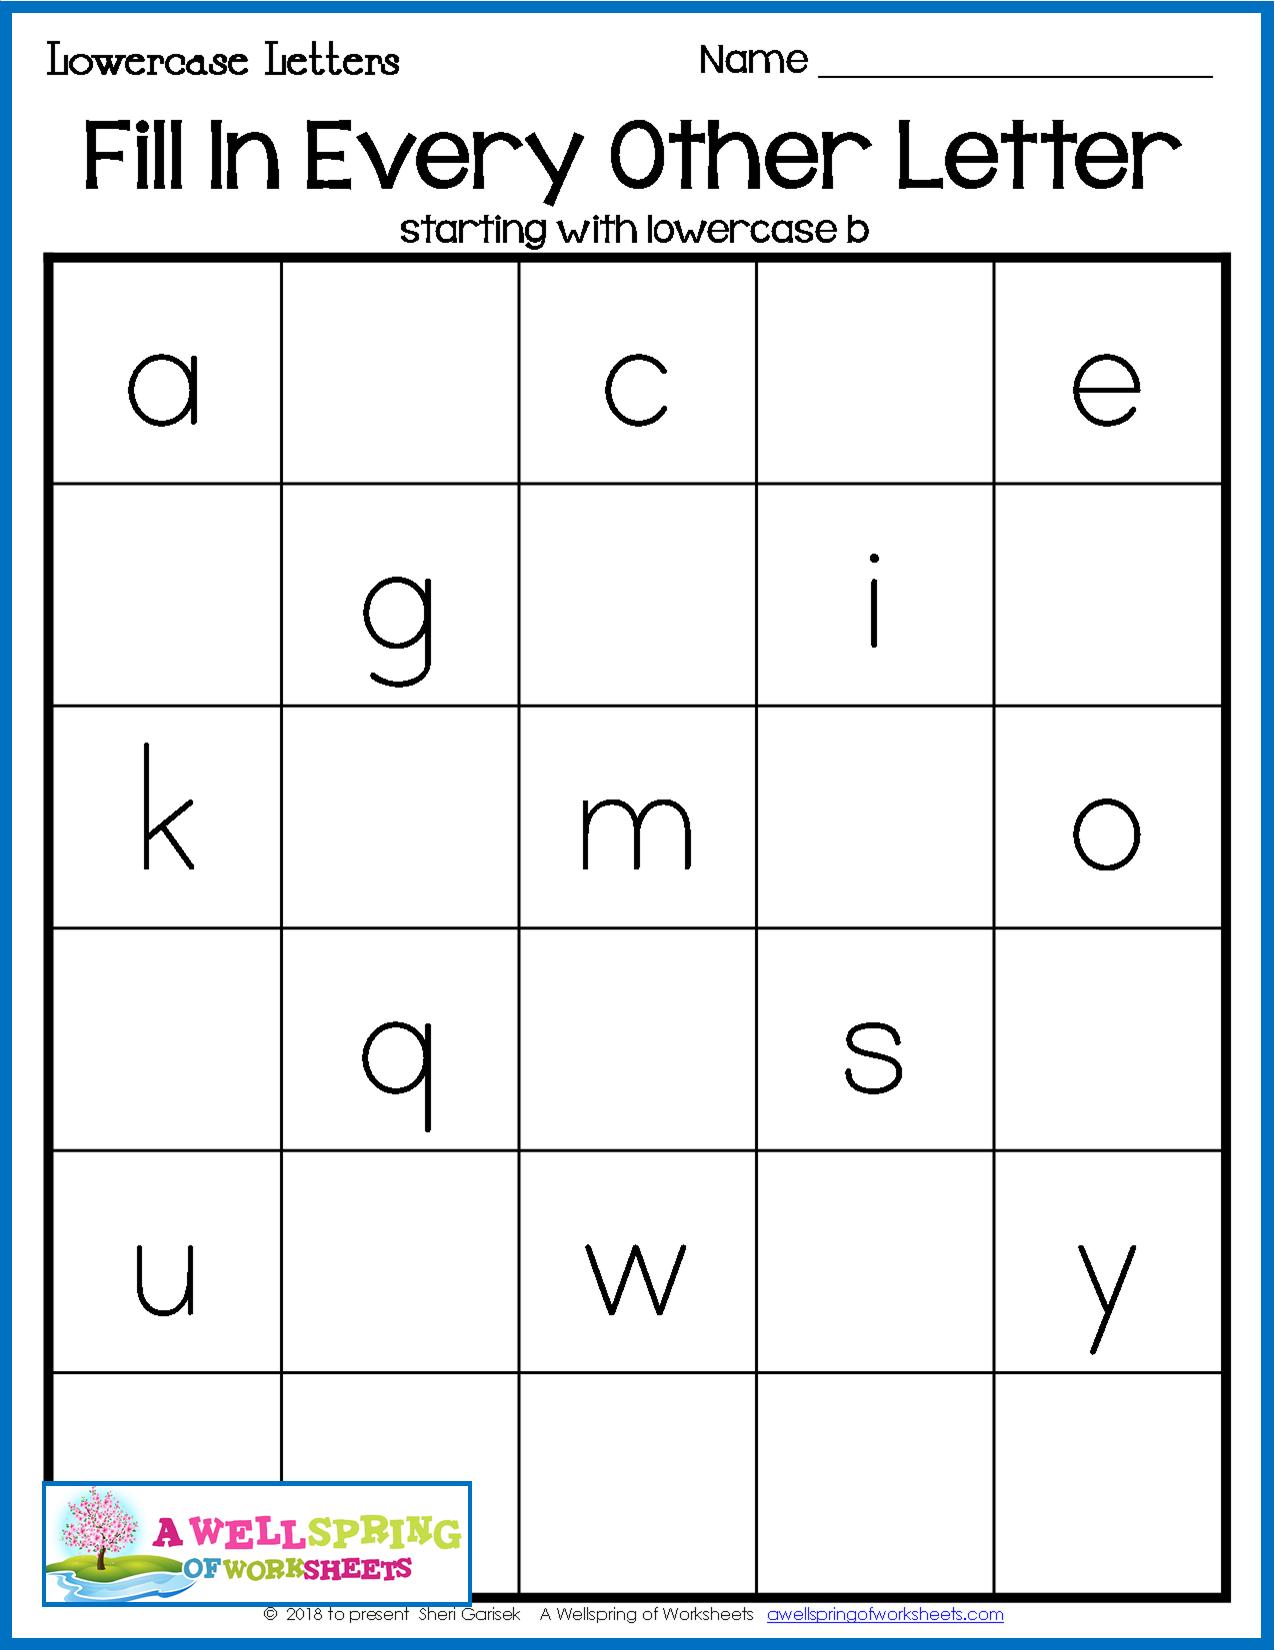 Hindi Swar Worksheets For Kindergarten Hindi Worksheets For Kindergarten Alphabet Worksheets Preschool Alphabet Worksheets Alphabet Worksheets Kindergarten [ 1650 x 1275 Pixel ]